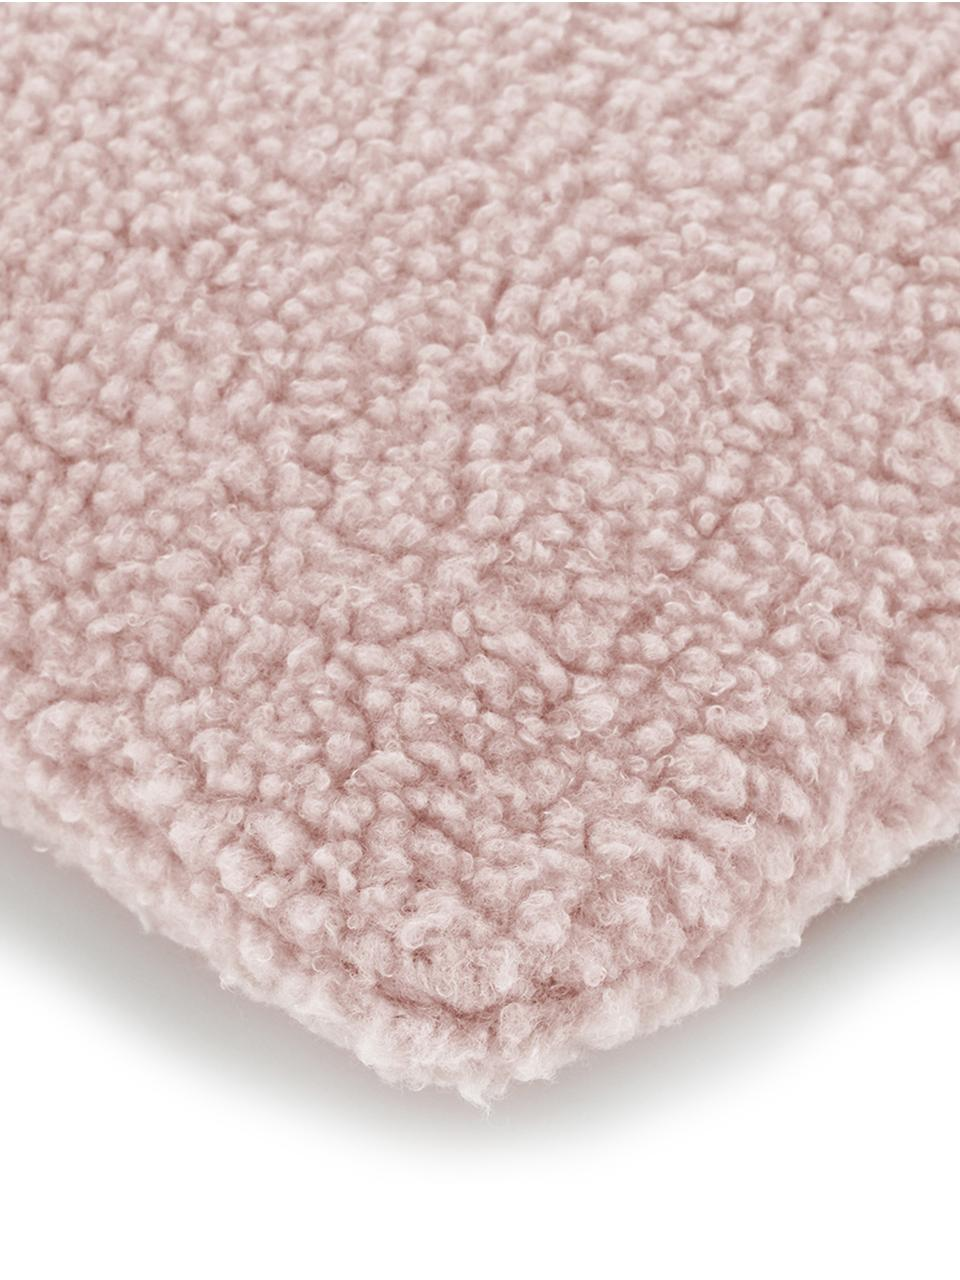 Federa arredo in teddy rosa Mille, Retro: 100% poliestere (teddy), Rosa, Larg. 30 x Lung. 50 cm